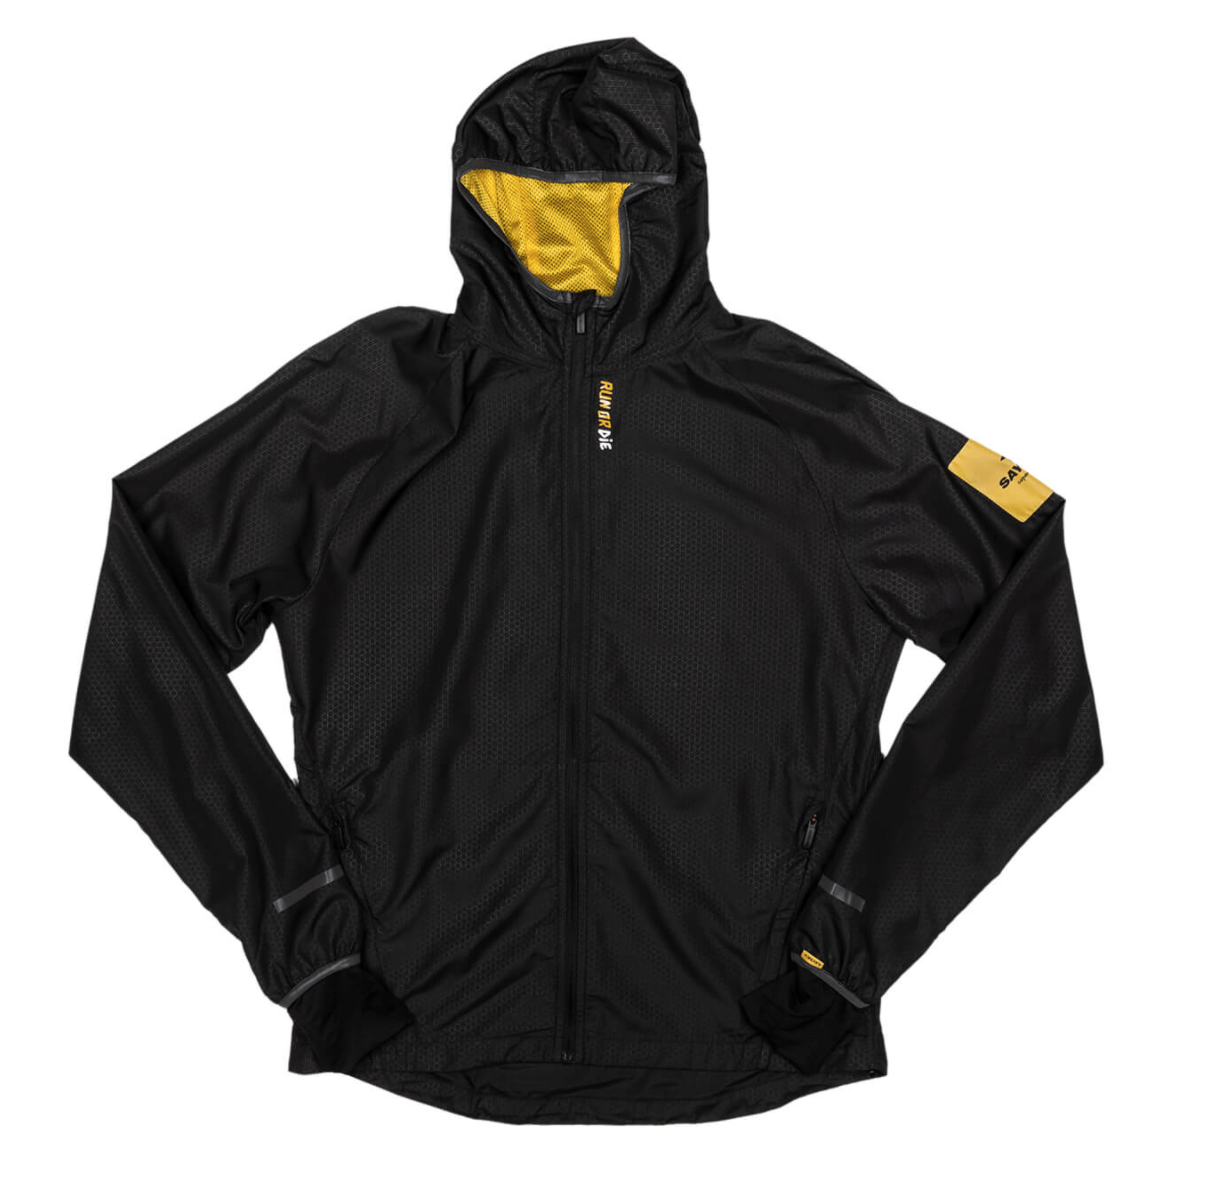 【NEW!】SAYSKY セイスカイ ランニングジャケット Run Or Die Pace Jacket - BLACK [ユニセックス] FMRJA03